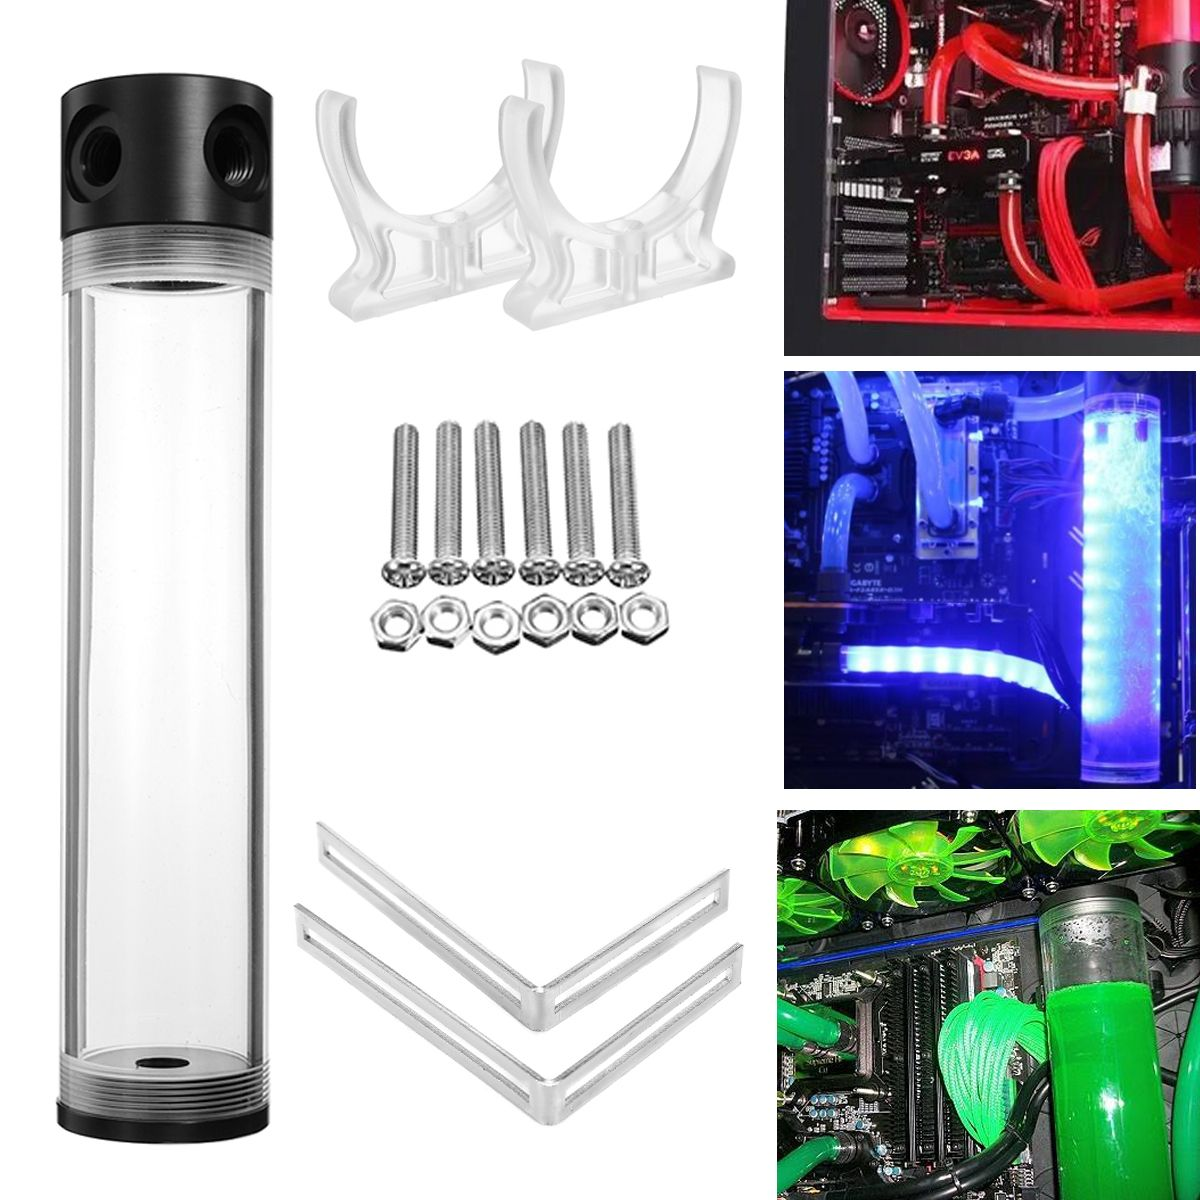 G1 4 T 50mm X 400mm Reservoir Helix Suspension Water Liquid